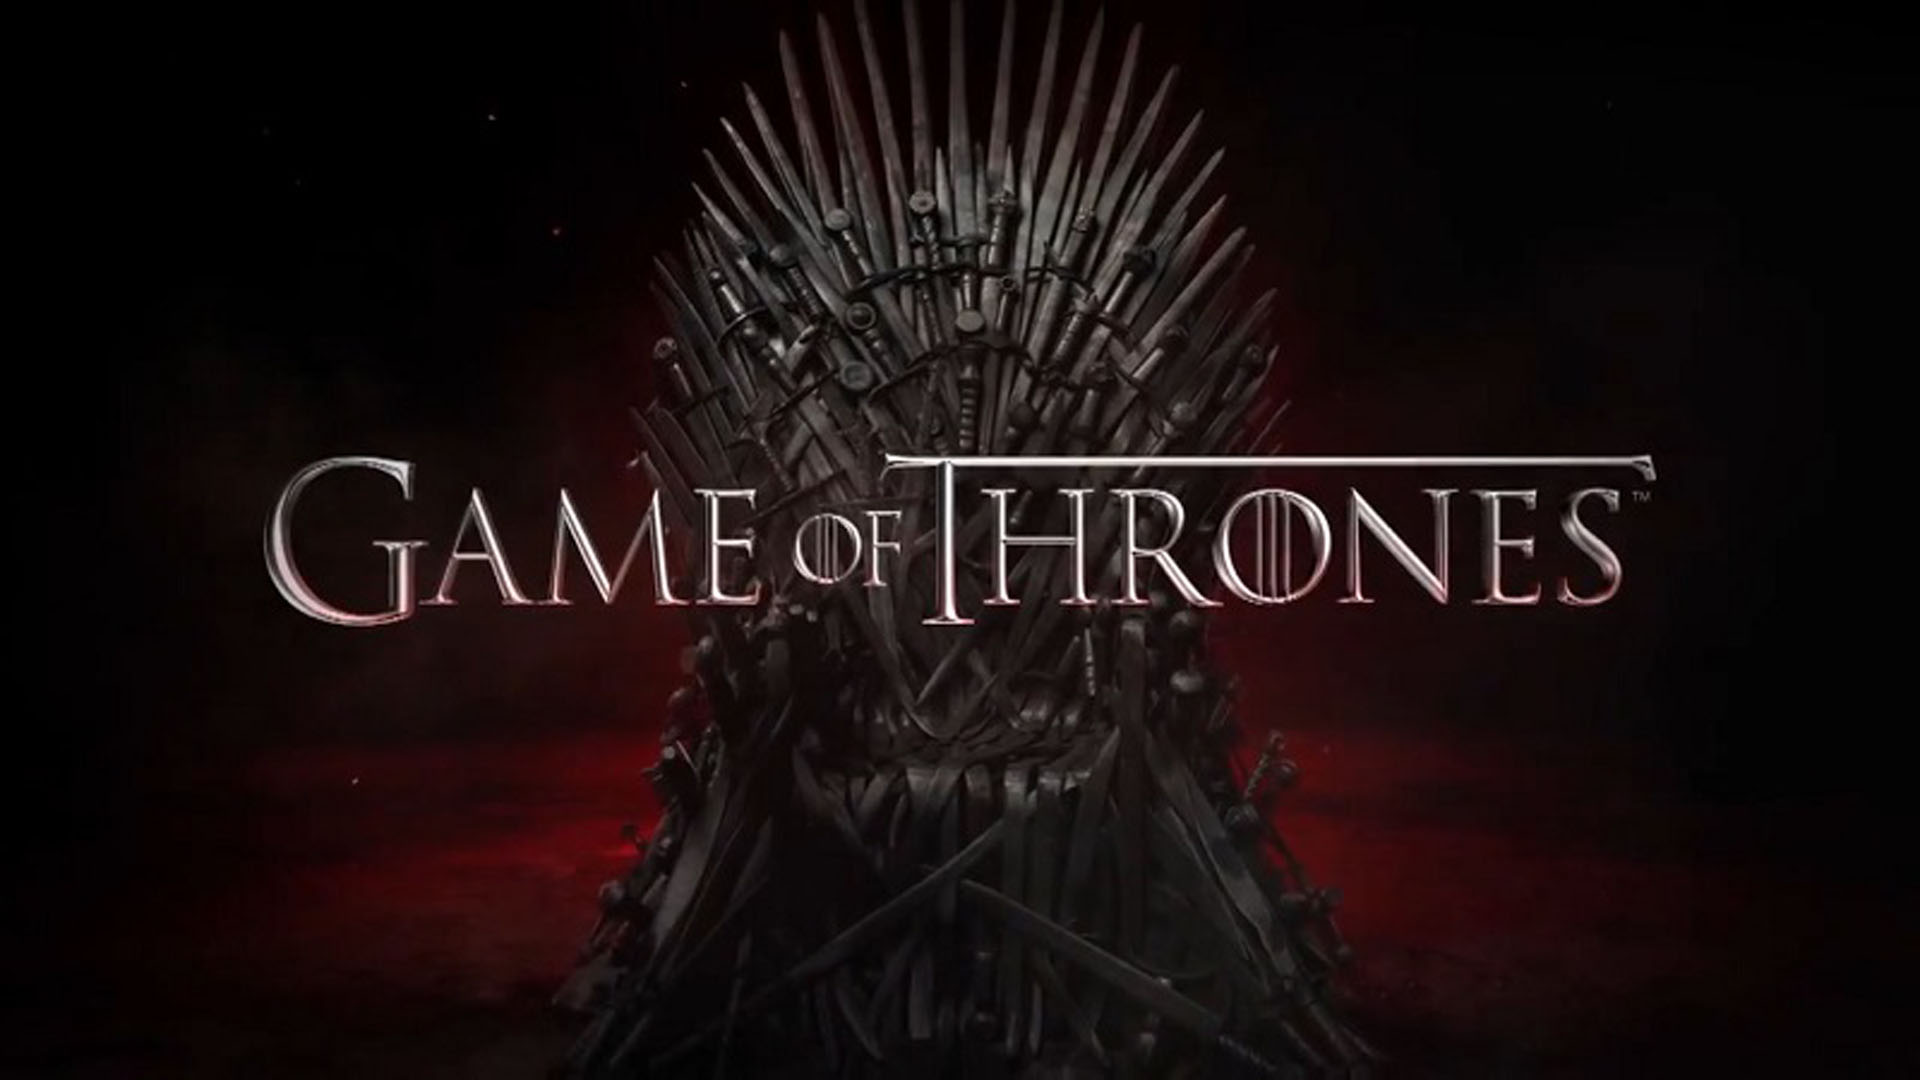 Kit Harington se convierte en otros personajes de 'Game of Thrones'